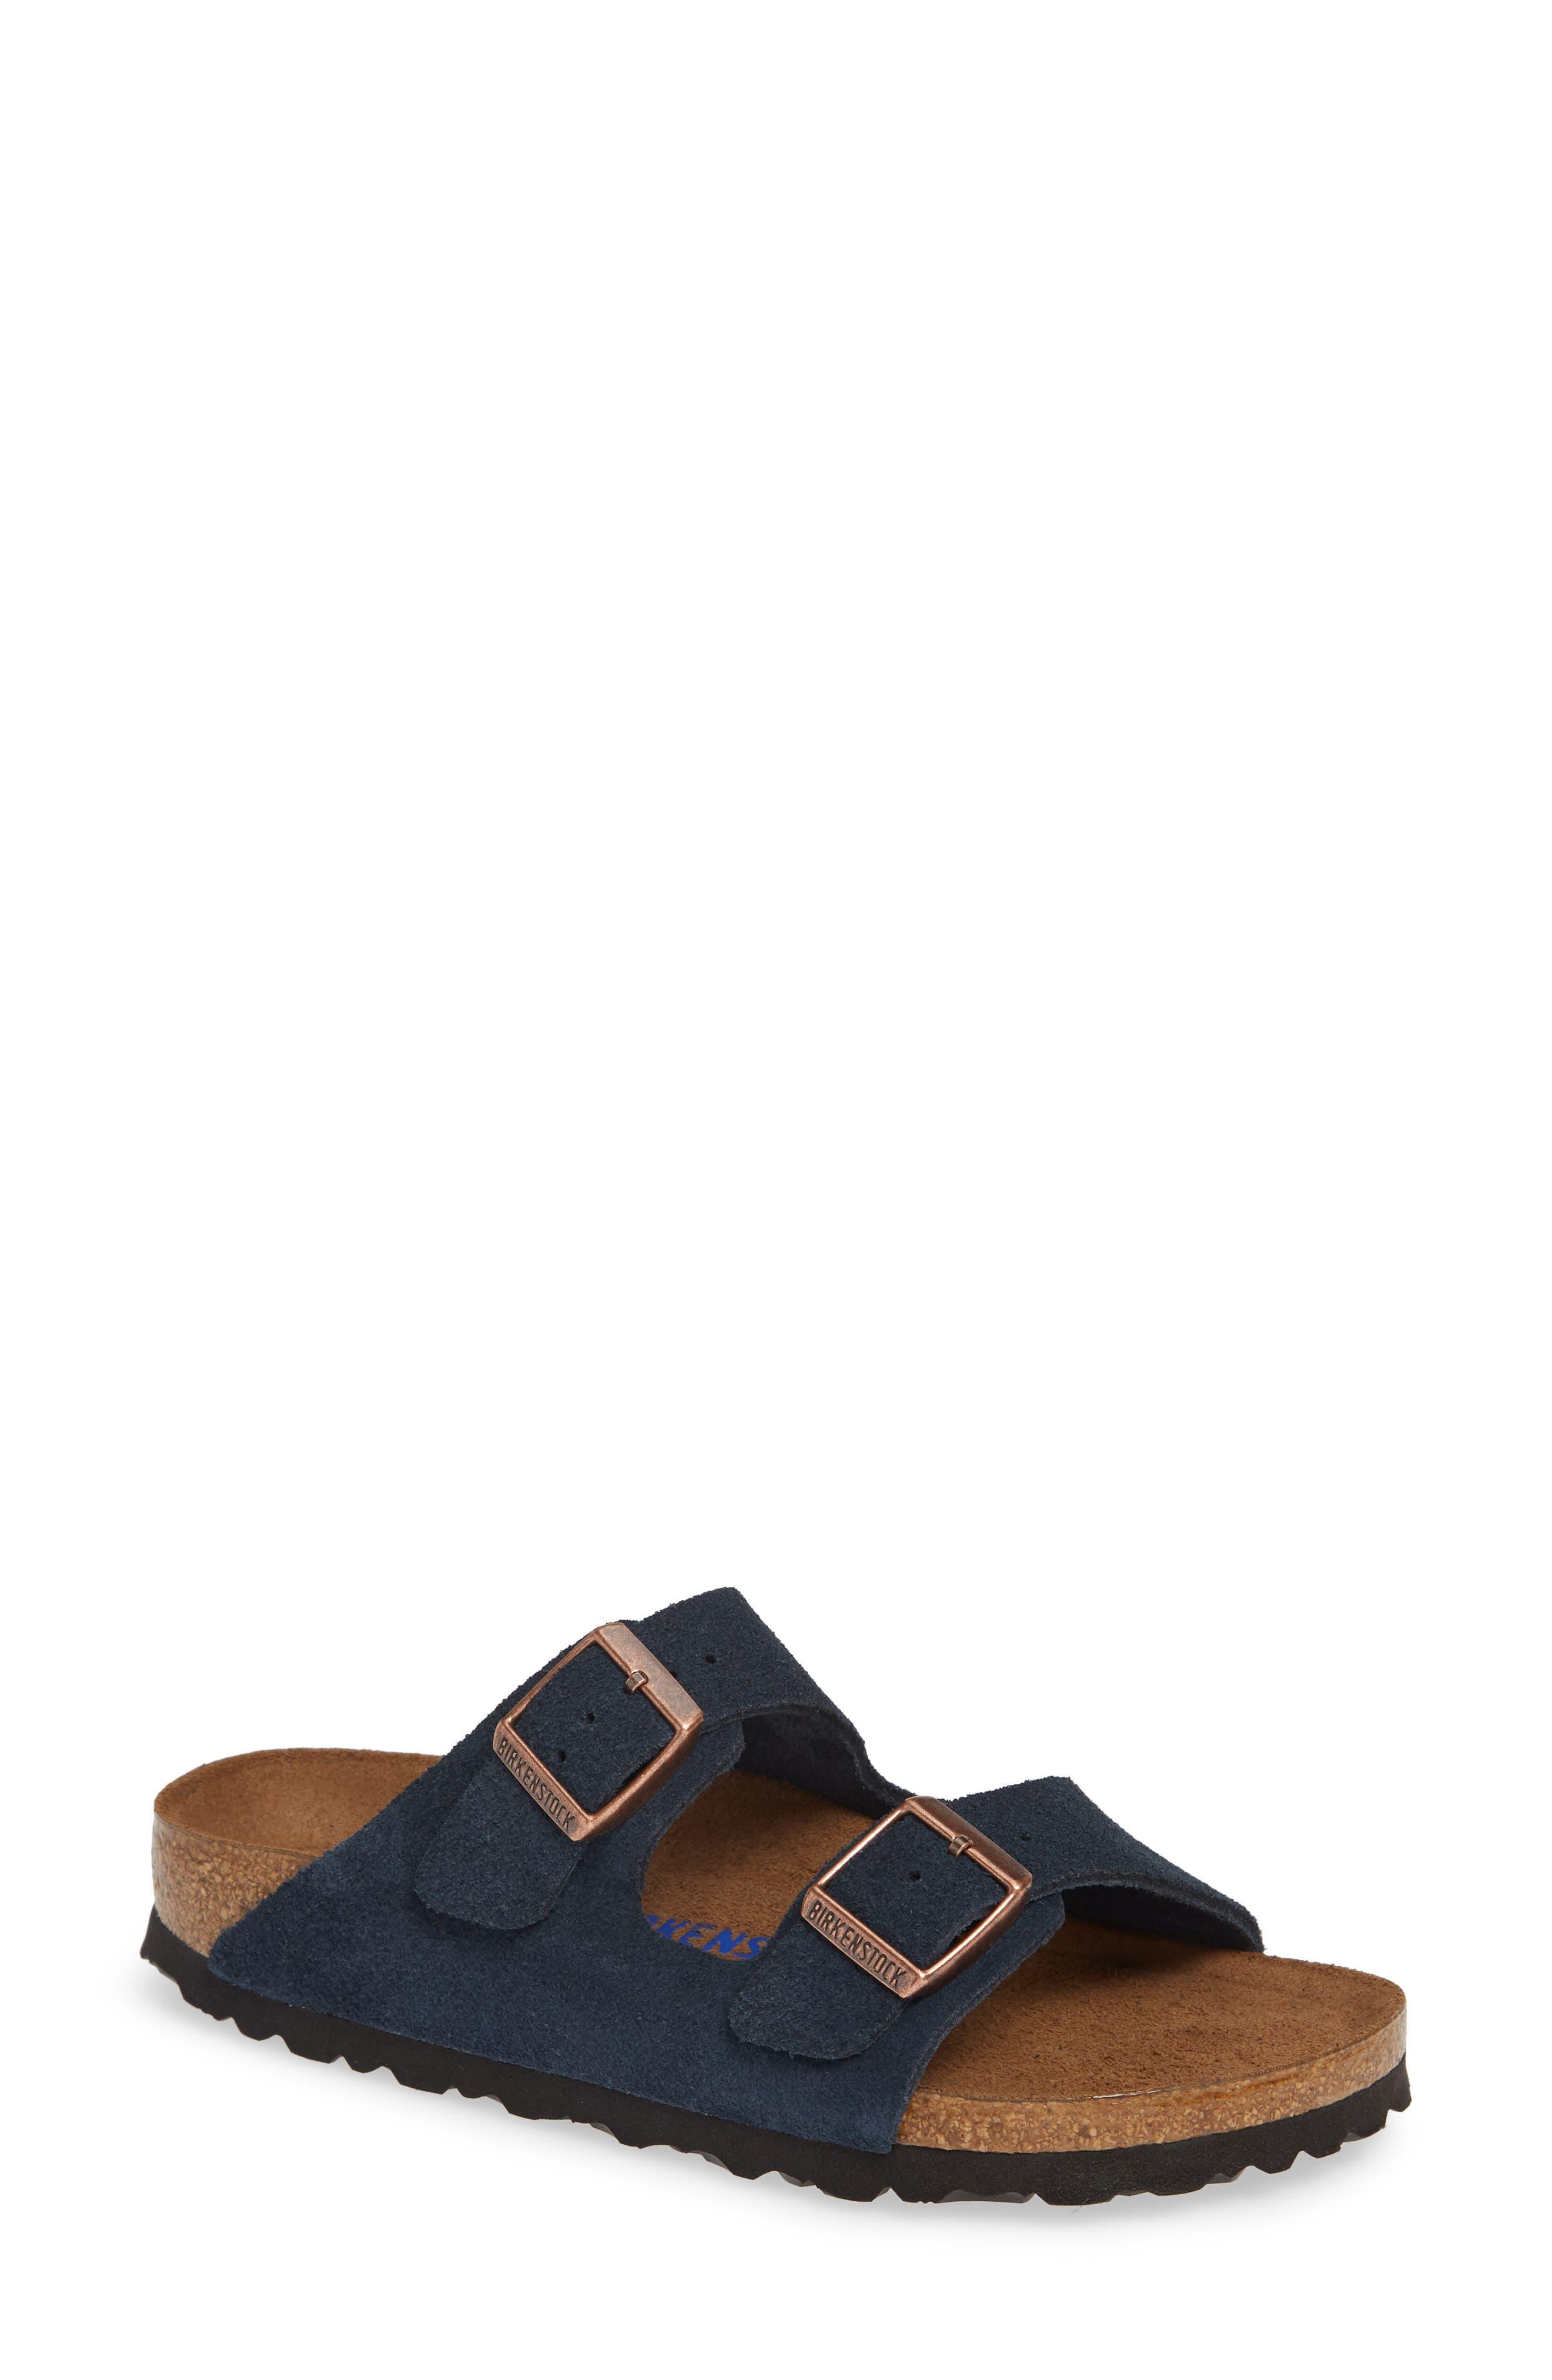 'Arizona' Soft Footbed Suede Sandal,                             Main thumbnail 1, color,                             Navy